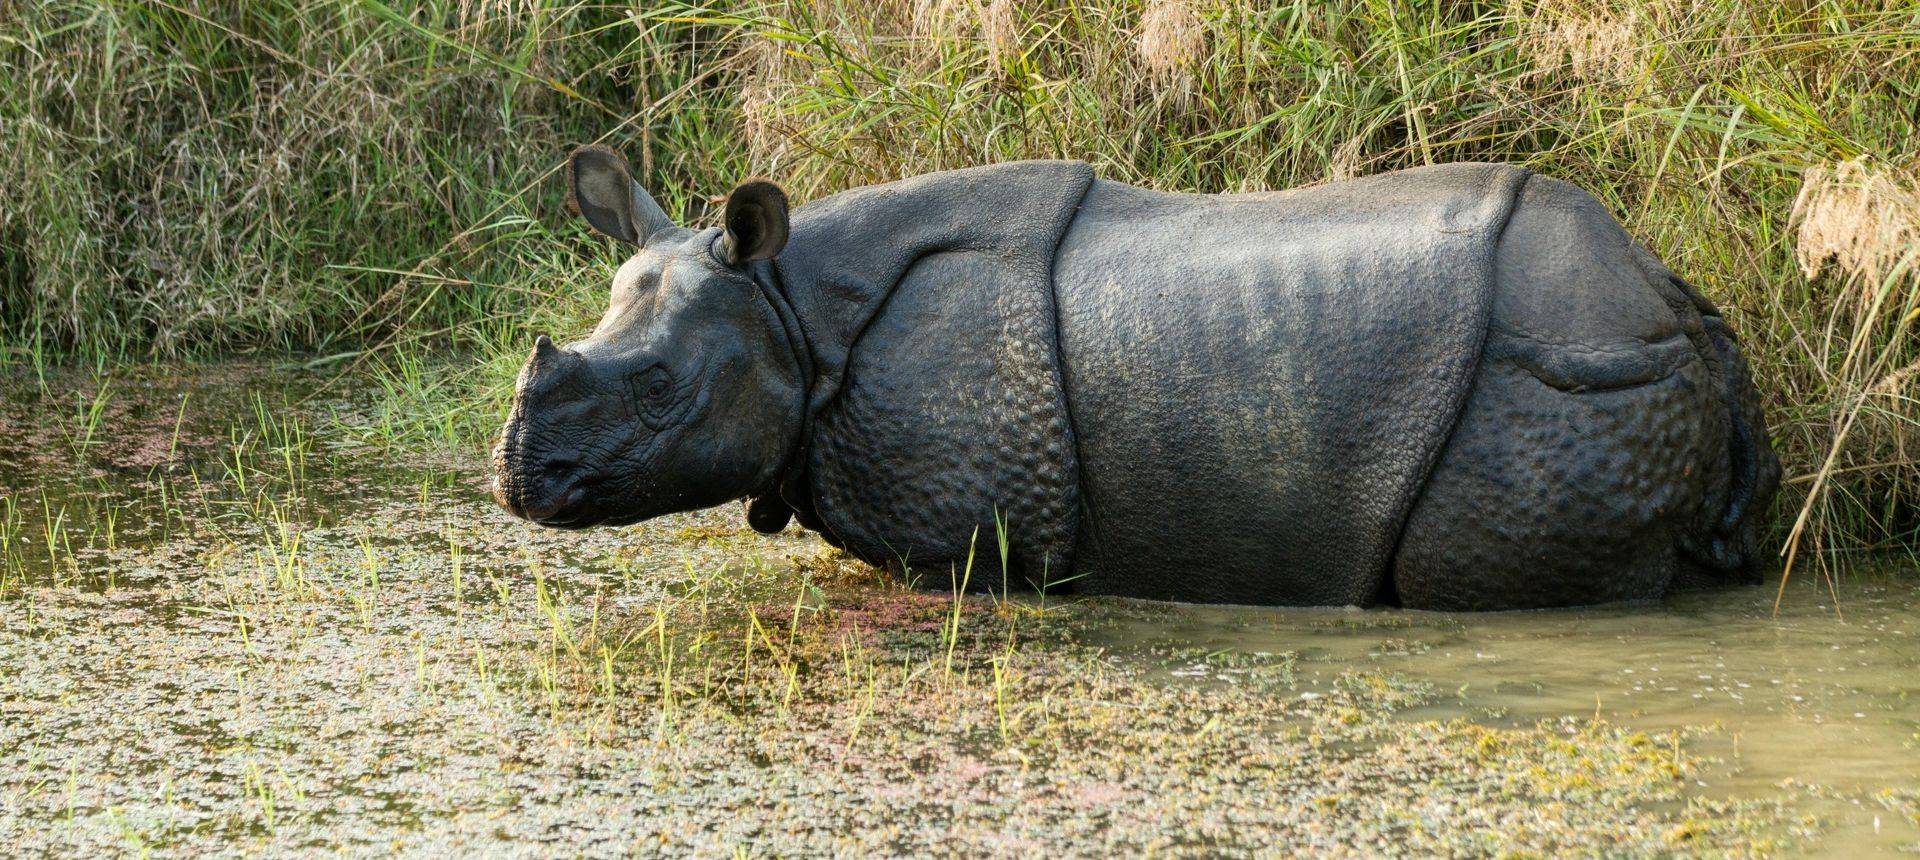 Wild Rhino (In Chitwan NP, Nepal) Shutterstock 69082825